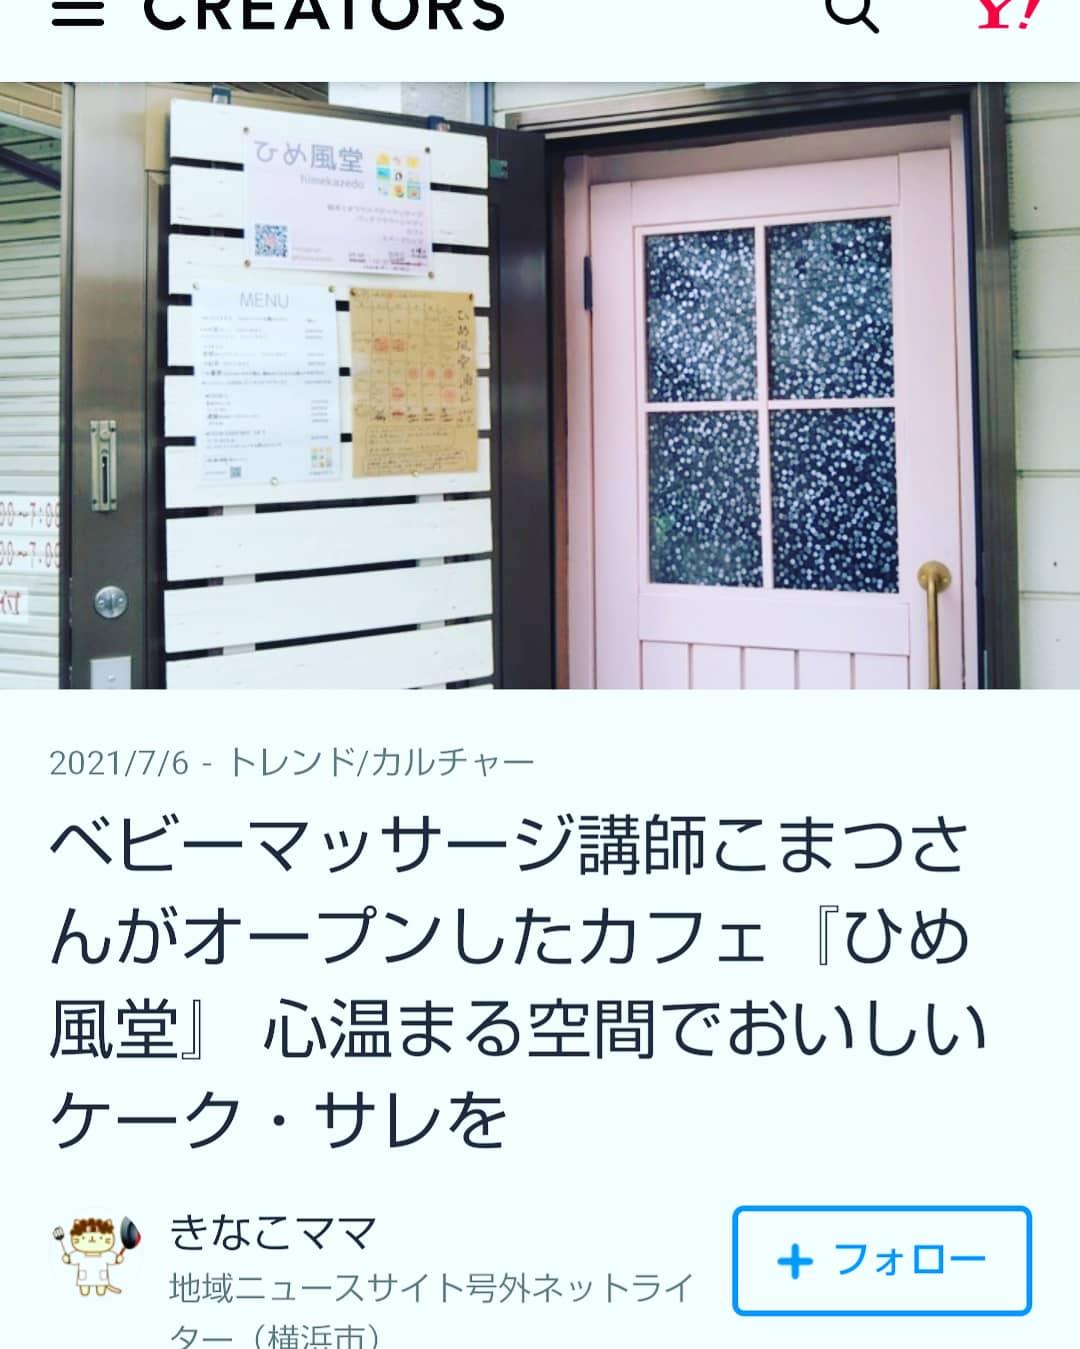 「Yahoo!の記事、見たよ!」と!相鉄線瀬谷 ひめ風堂 カフェ